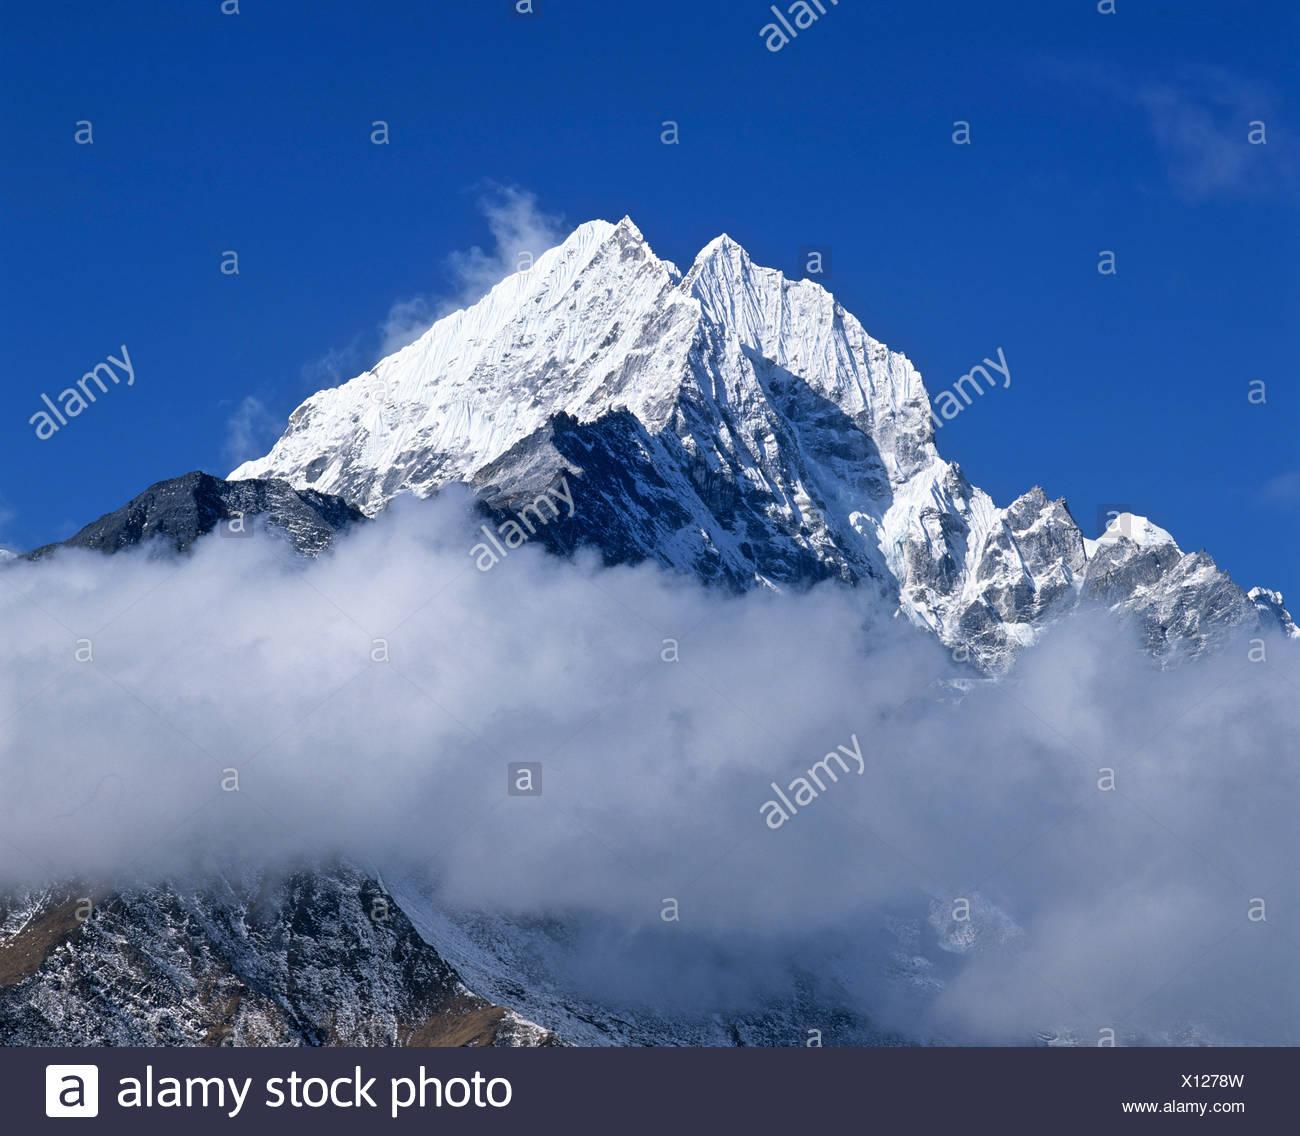 Mount Thamserku, 6632 metres, Khumbu, Himalayas, Nepal, South Asia - Stock Image